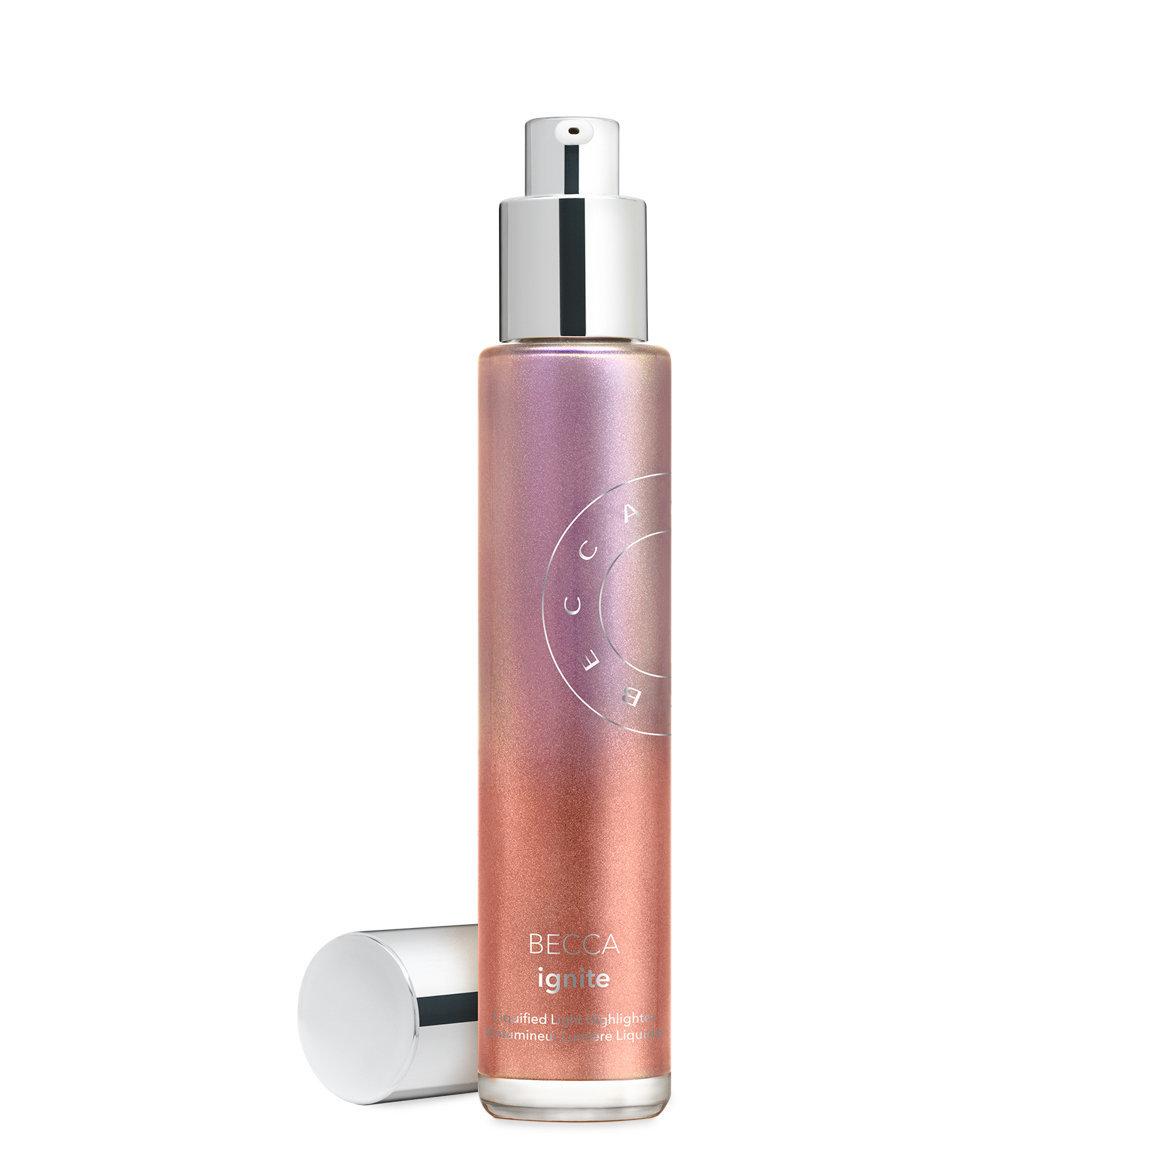 BECCA Cosmetics Ignite Liquified Light Highlighter Gratitude alternative view 1.